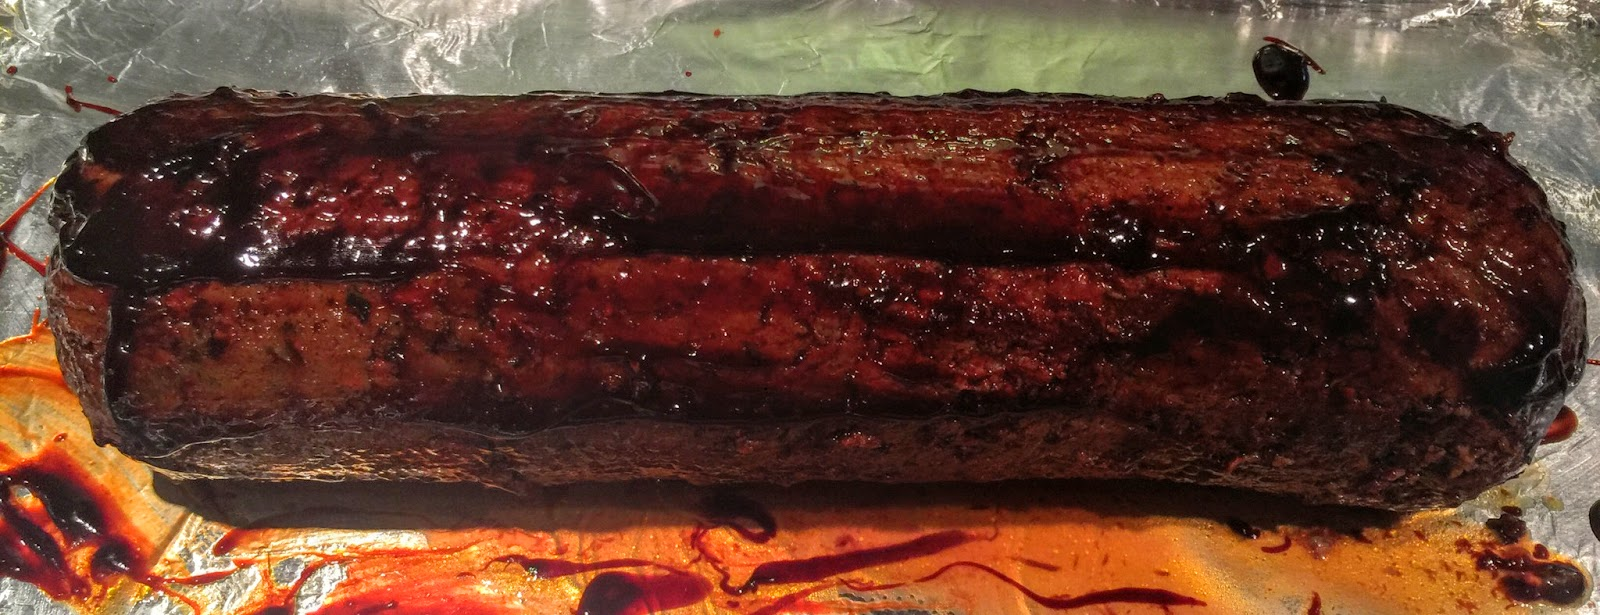 Meatloaf clipart carne asada Up mixed reduction below I